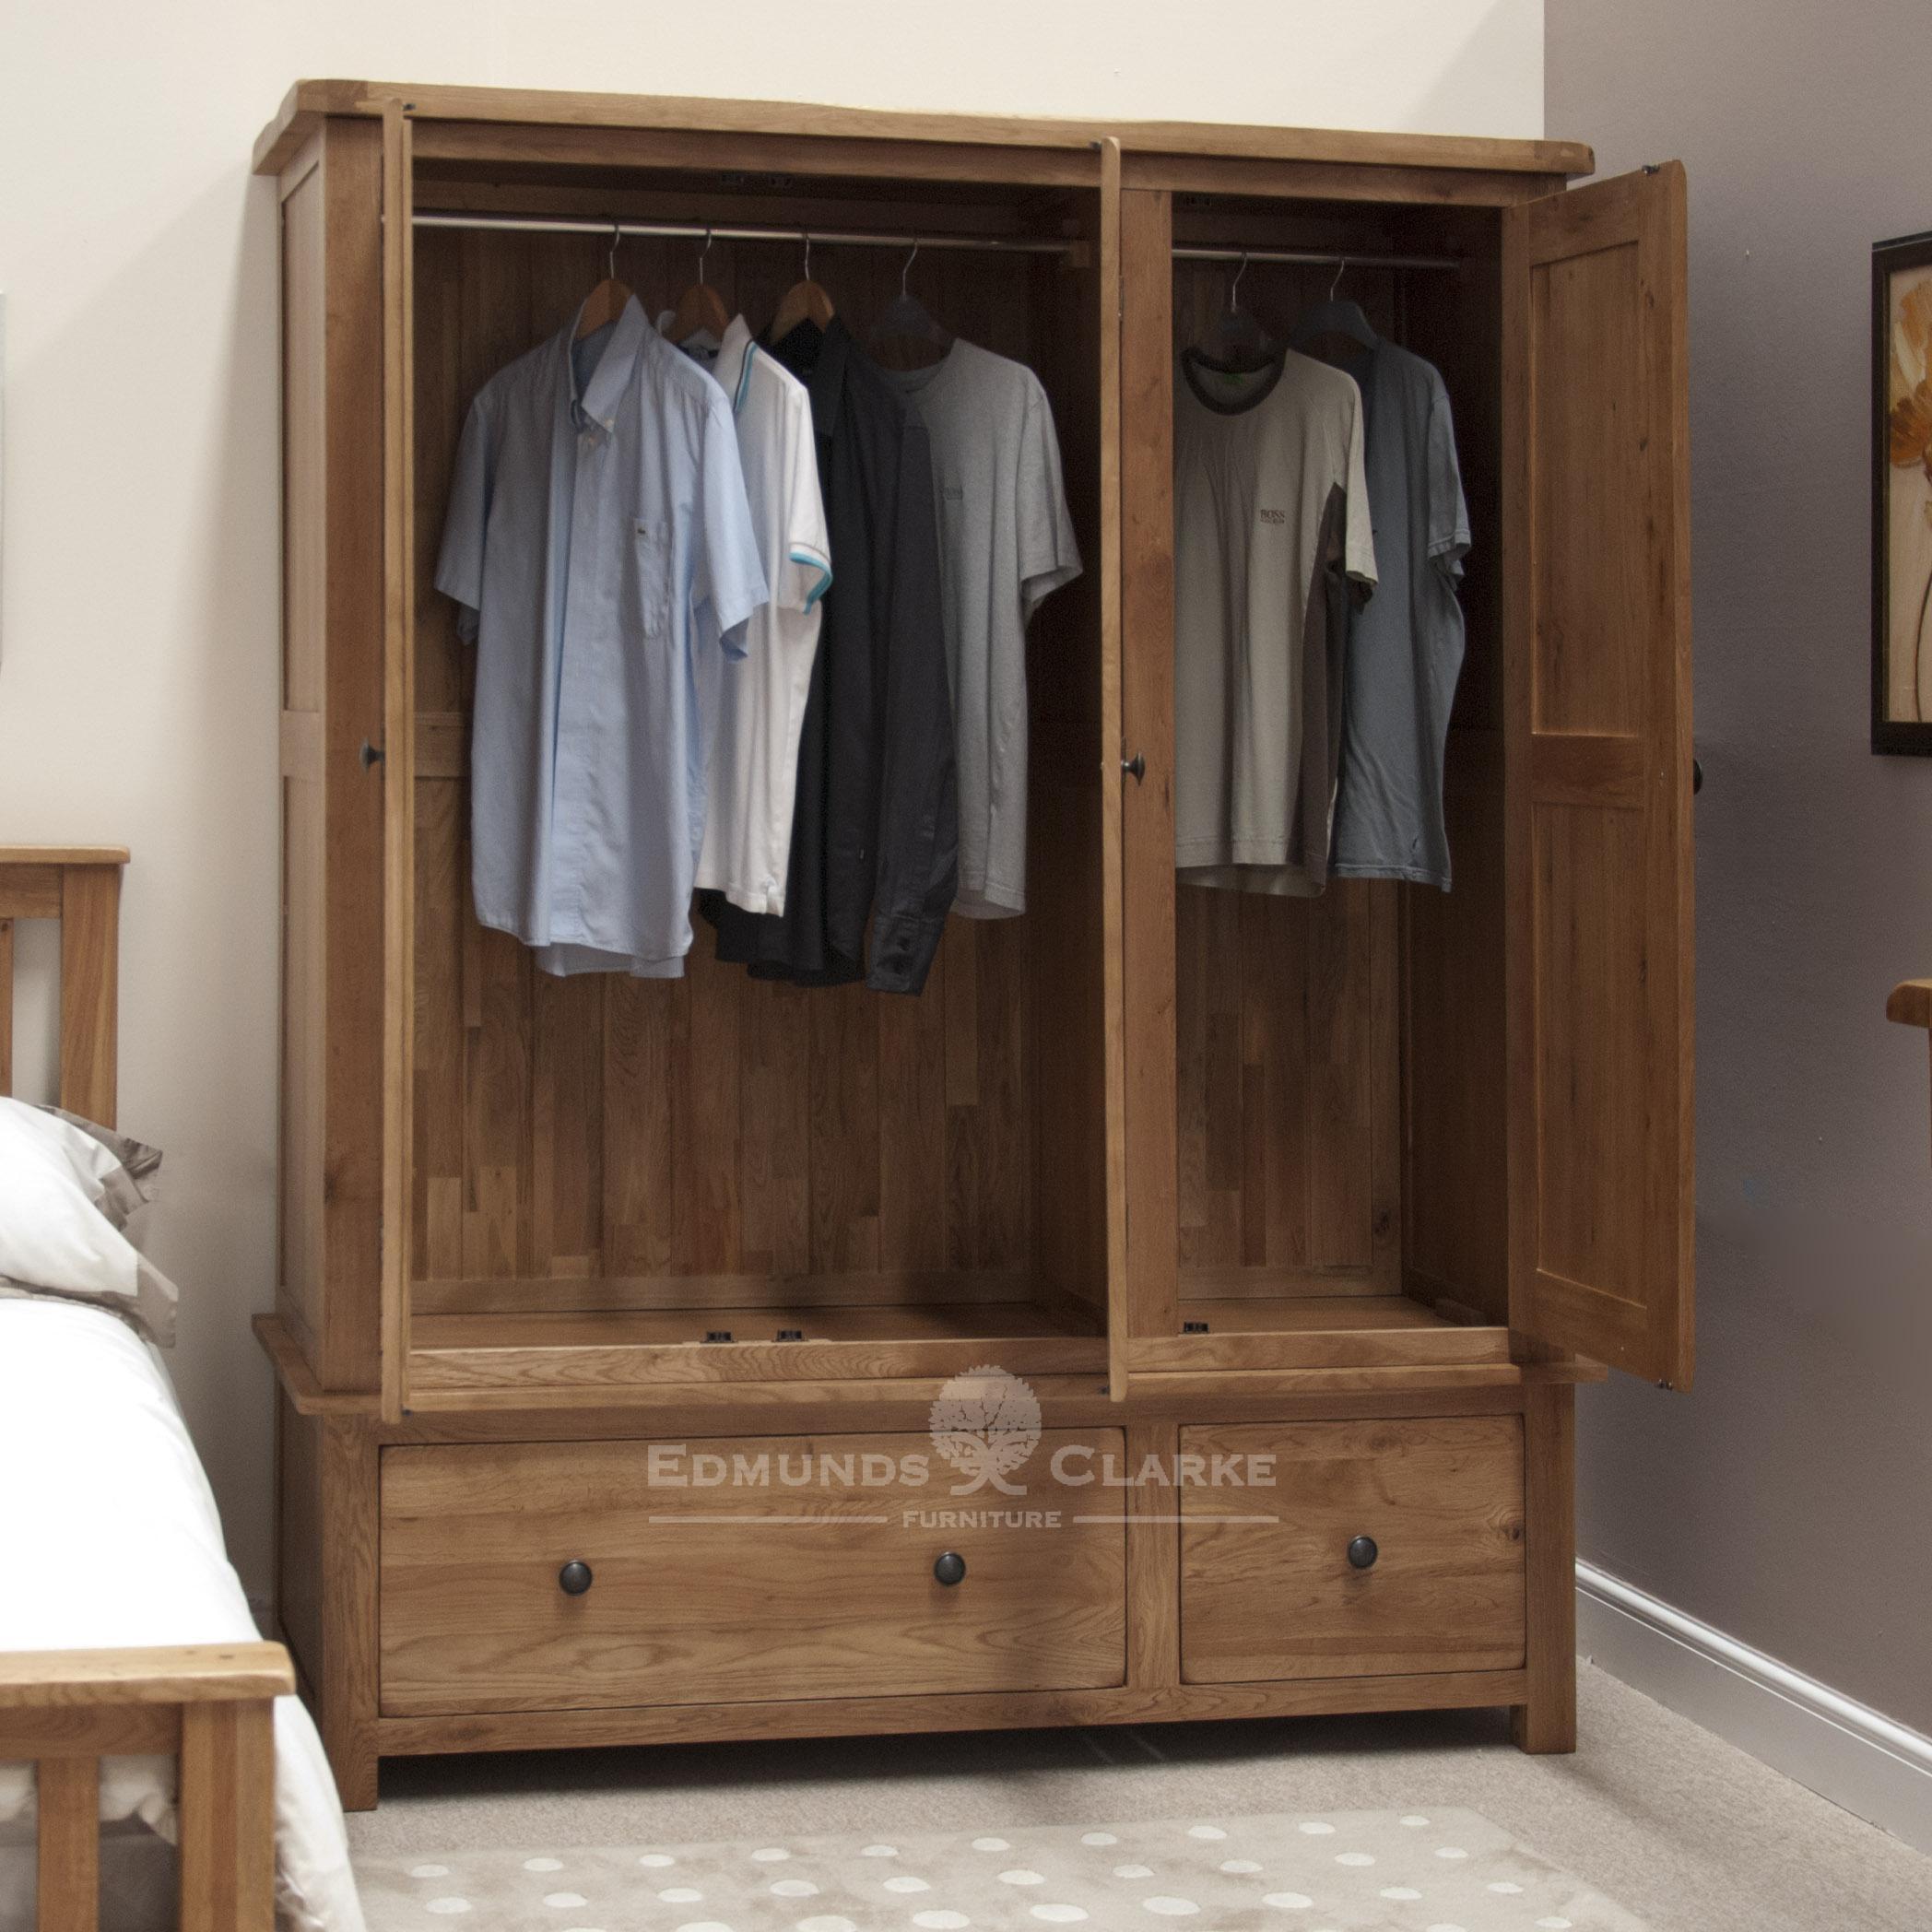 Solid oak triple wardrobe three door and two deep drawers